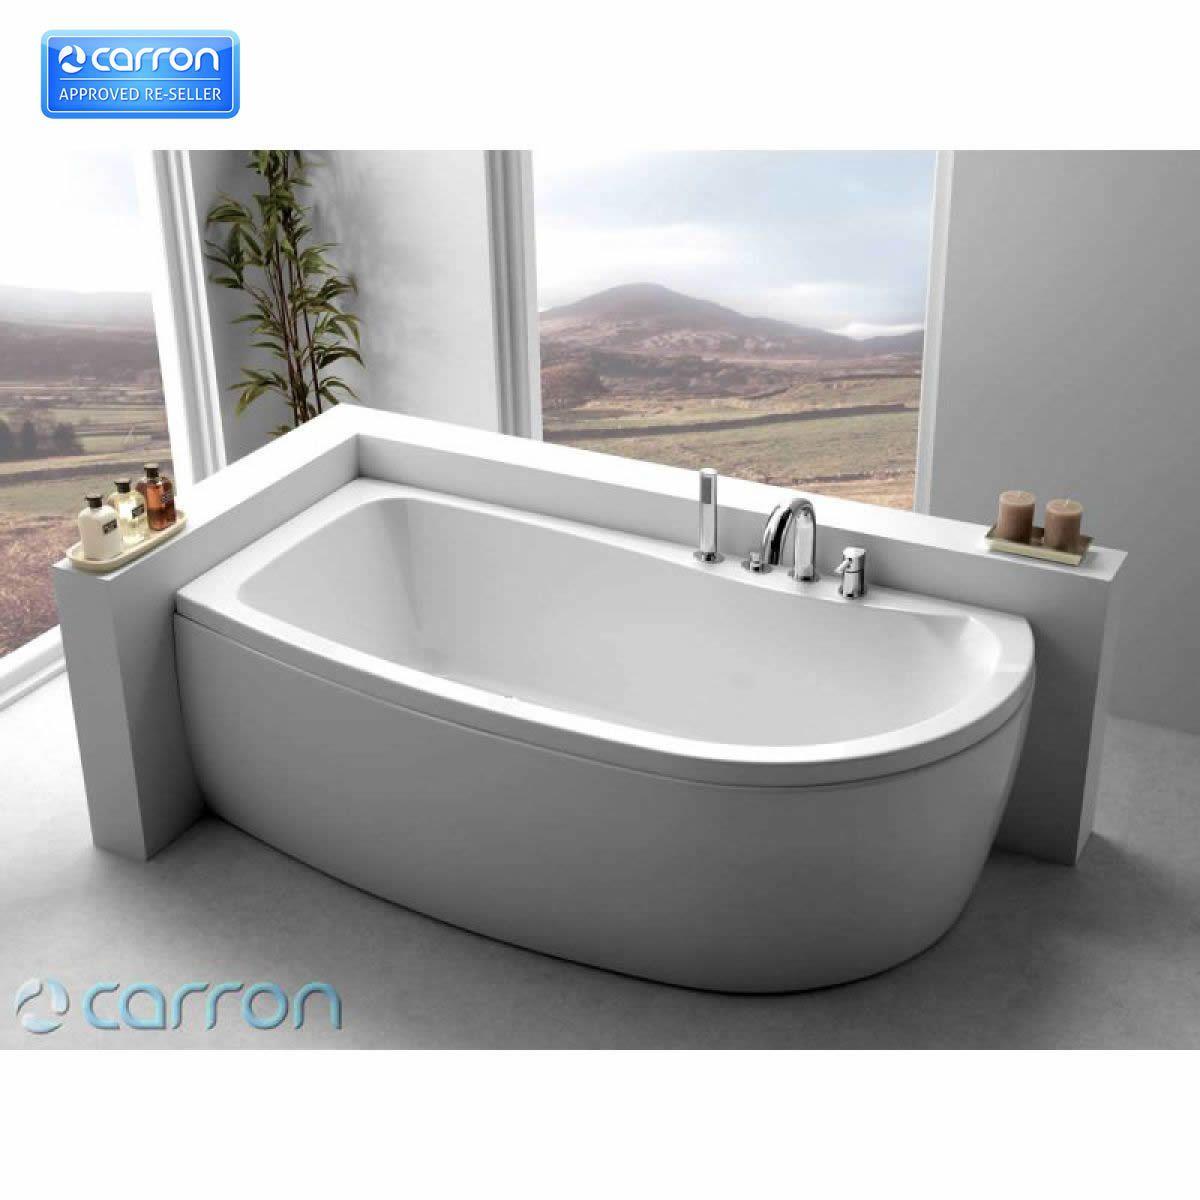 Carron Agenda 1700 x 700mm Corner Offset Shower Bath   Bathroom ...